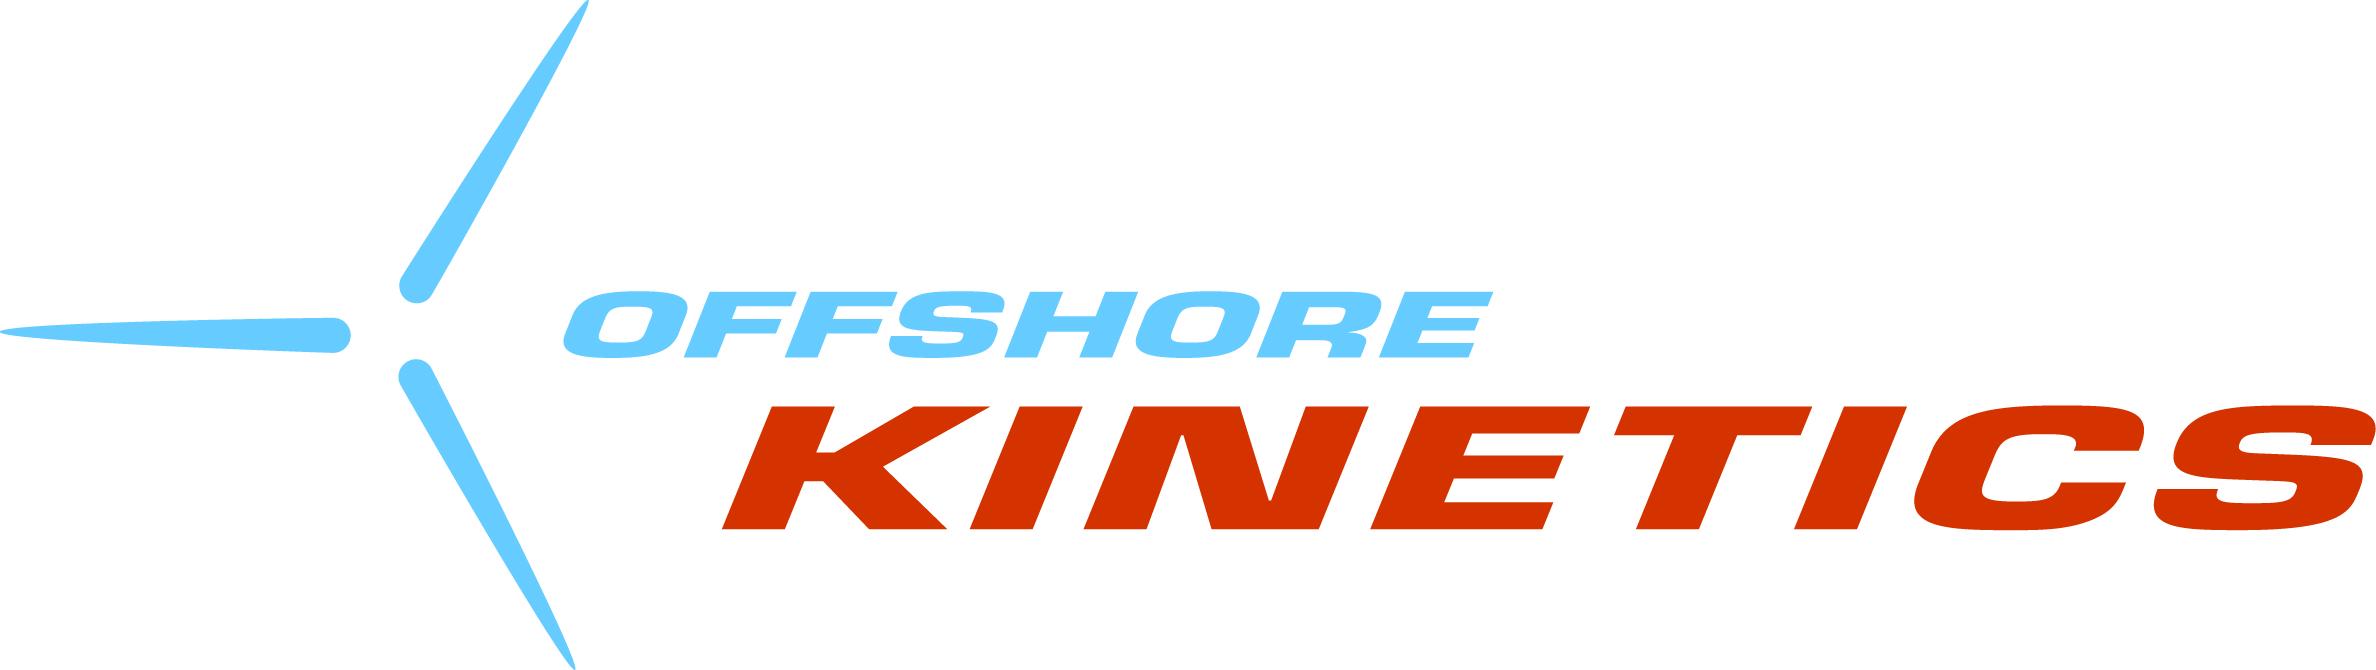 Offshore Kinetics